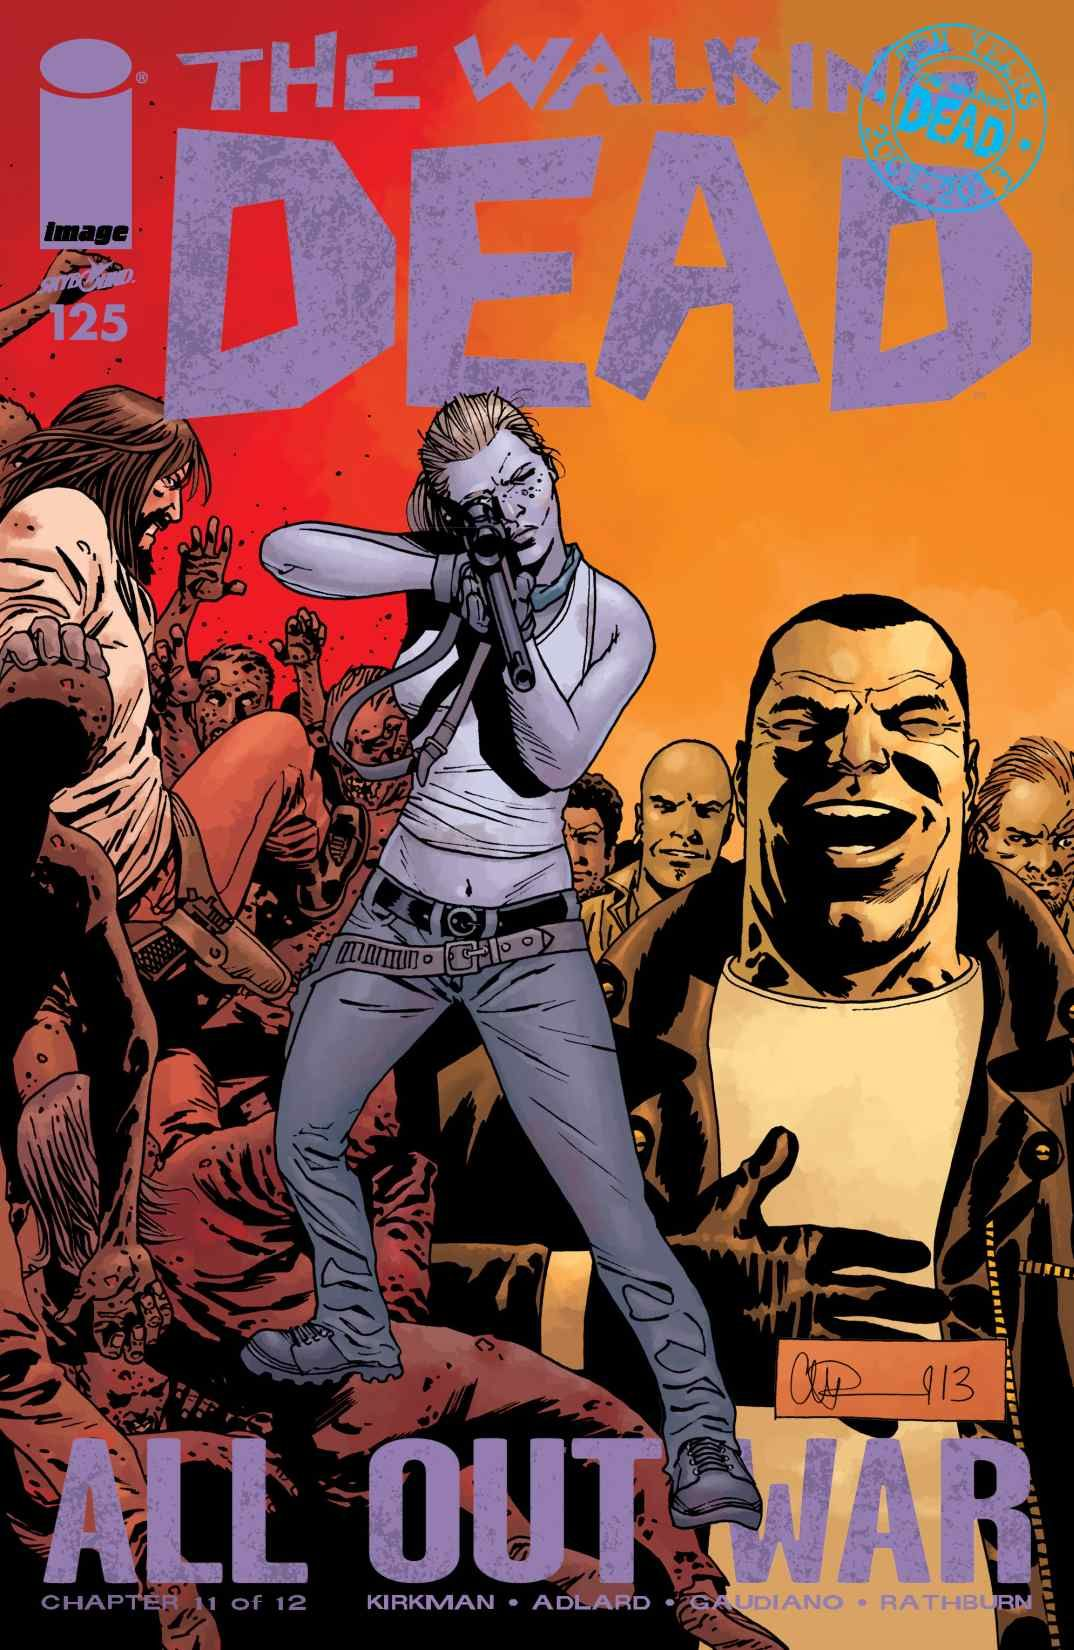 Read Comics Online Free - The Walking Dead - Chapter 125